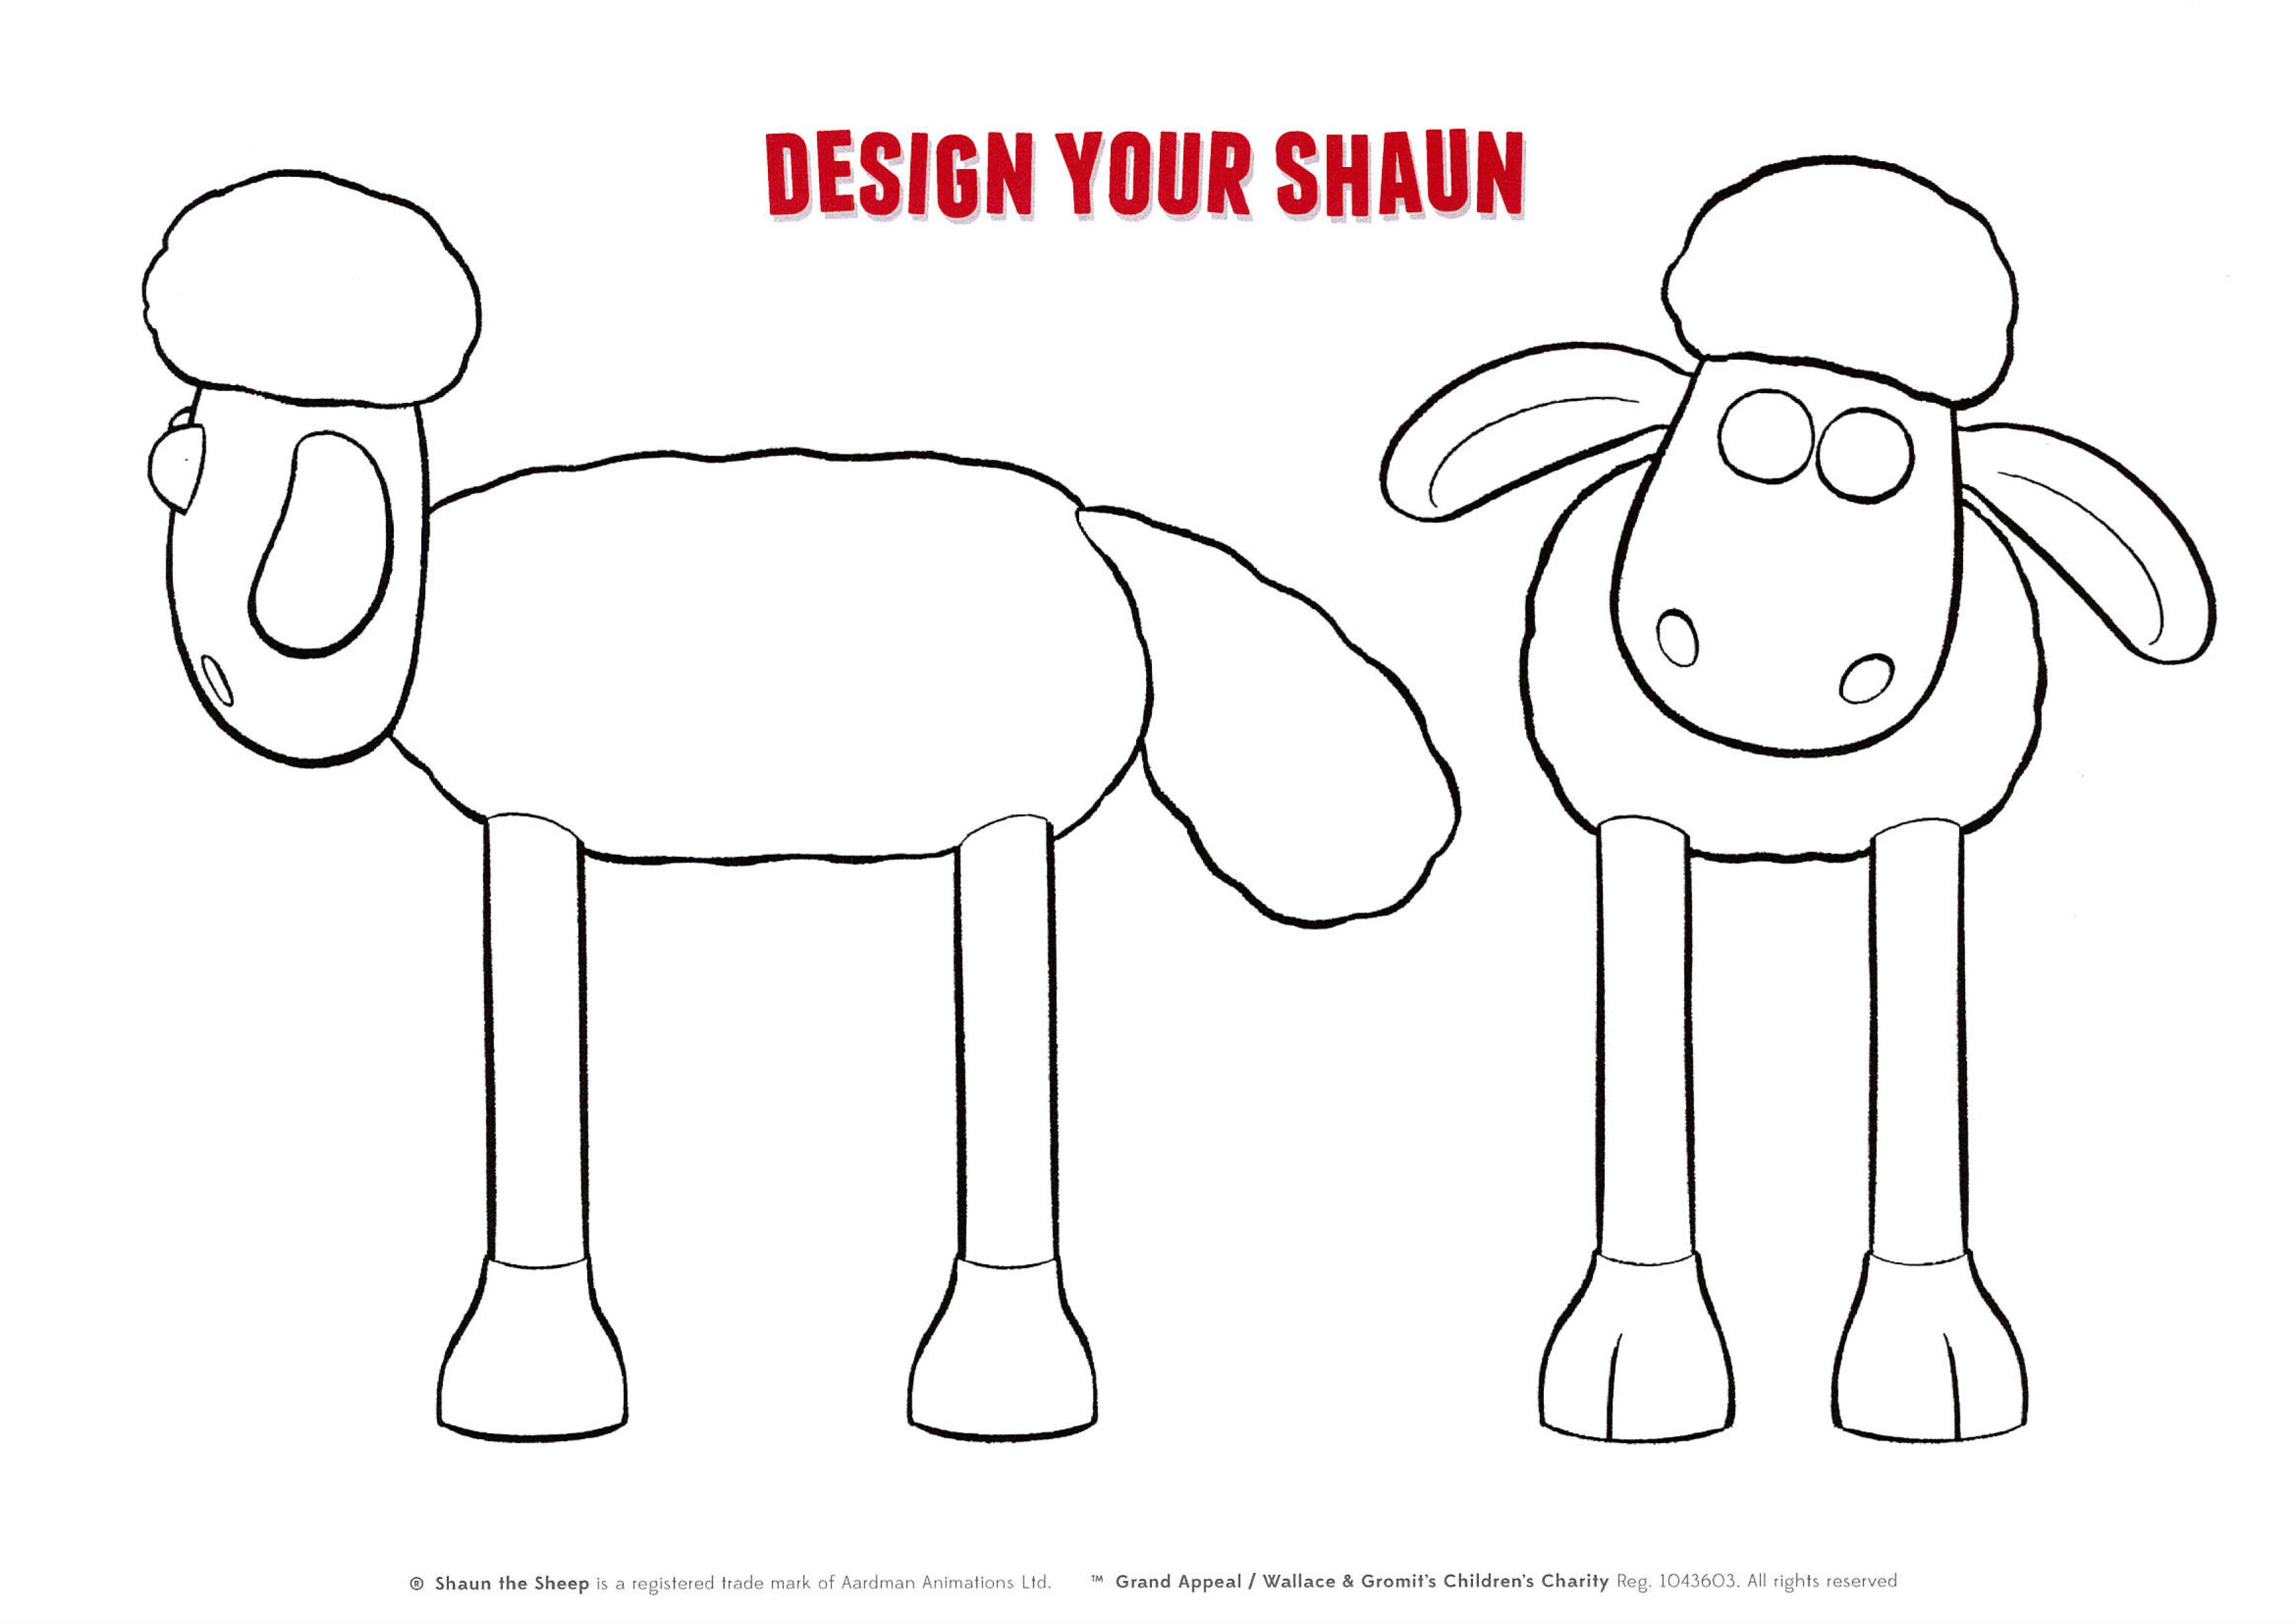 Drawn sheep shaun the sheep Shaun_edited the to Design your